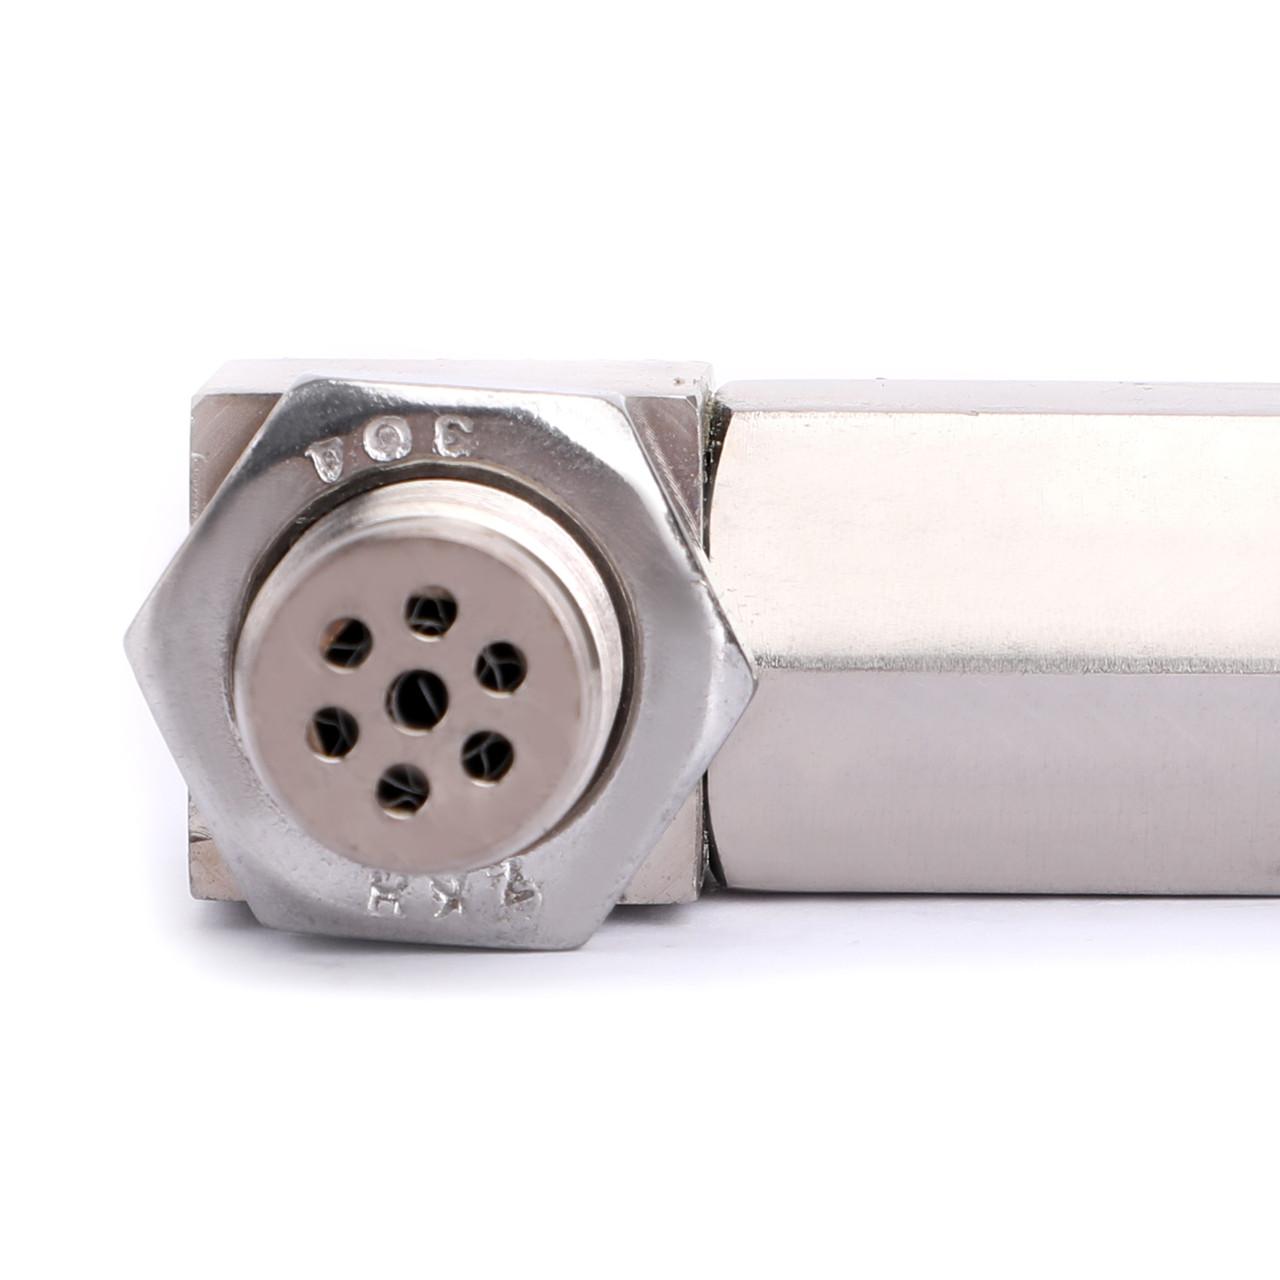 90 O2 Oxygen Sensor Spacer Engine Light Check Bung Mini Catalytic Converter